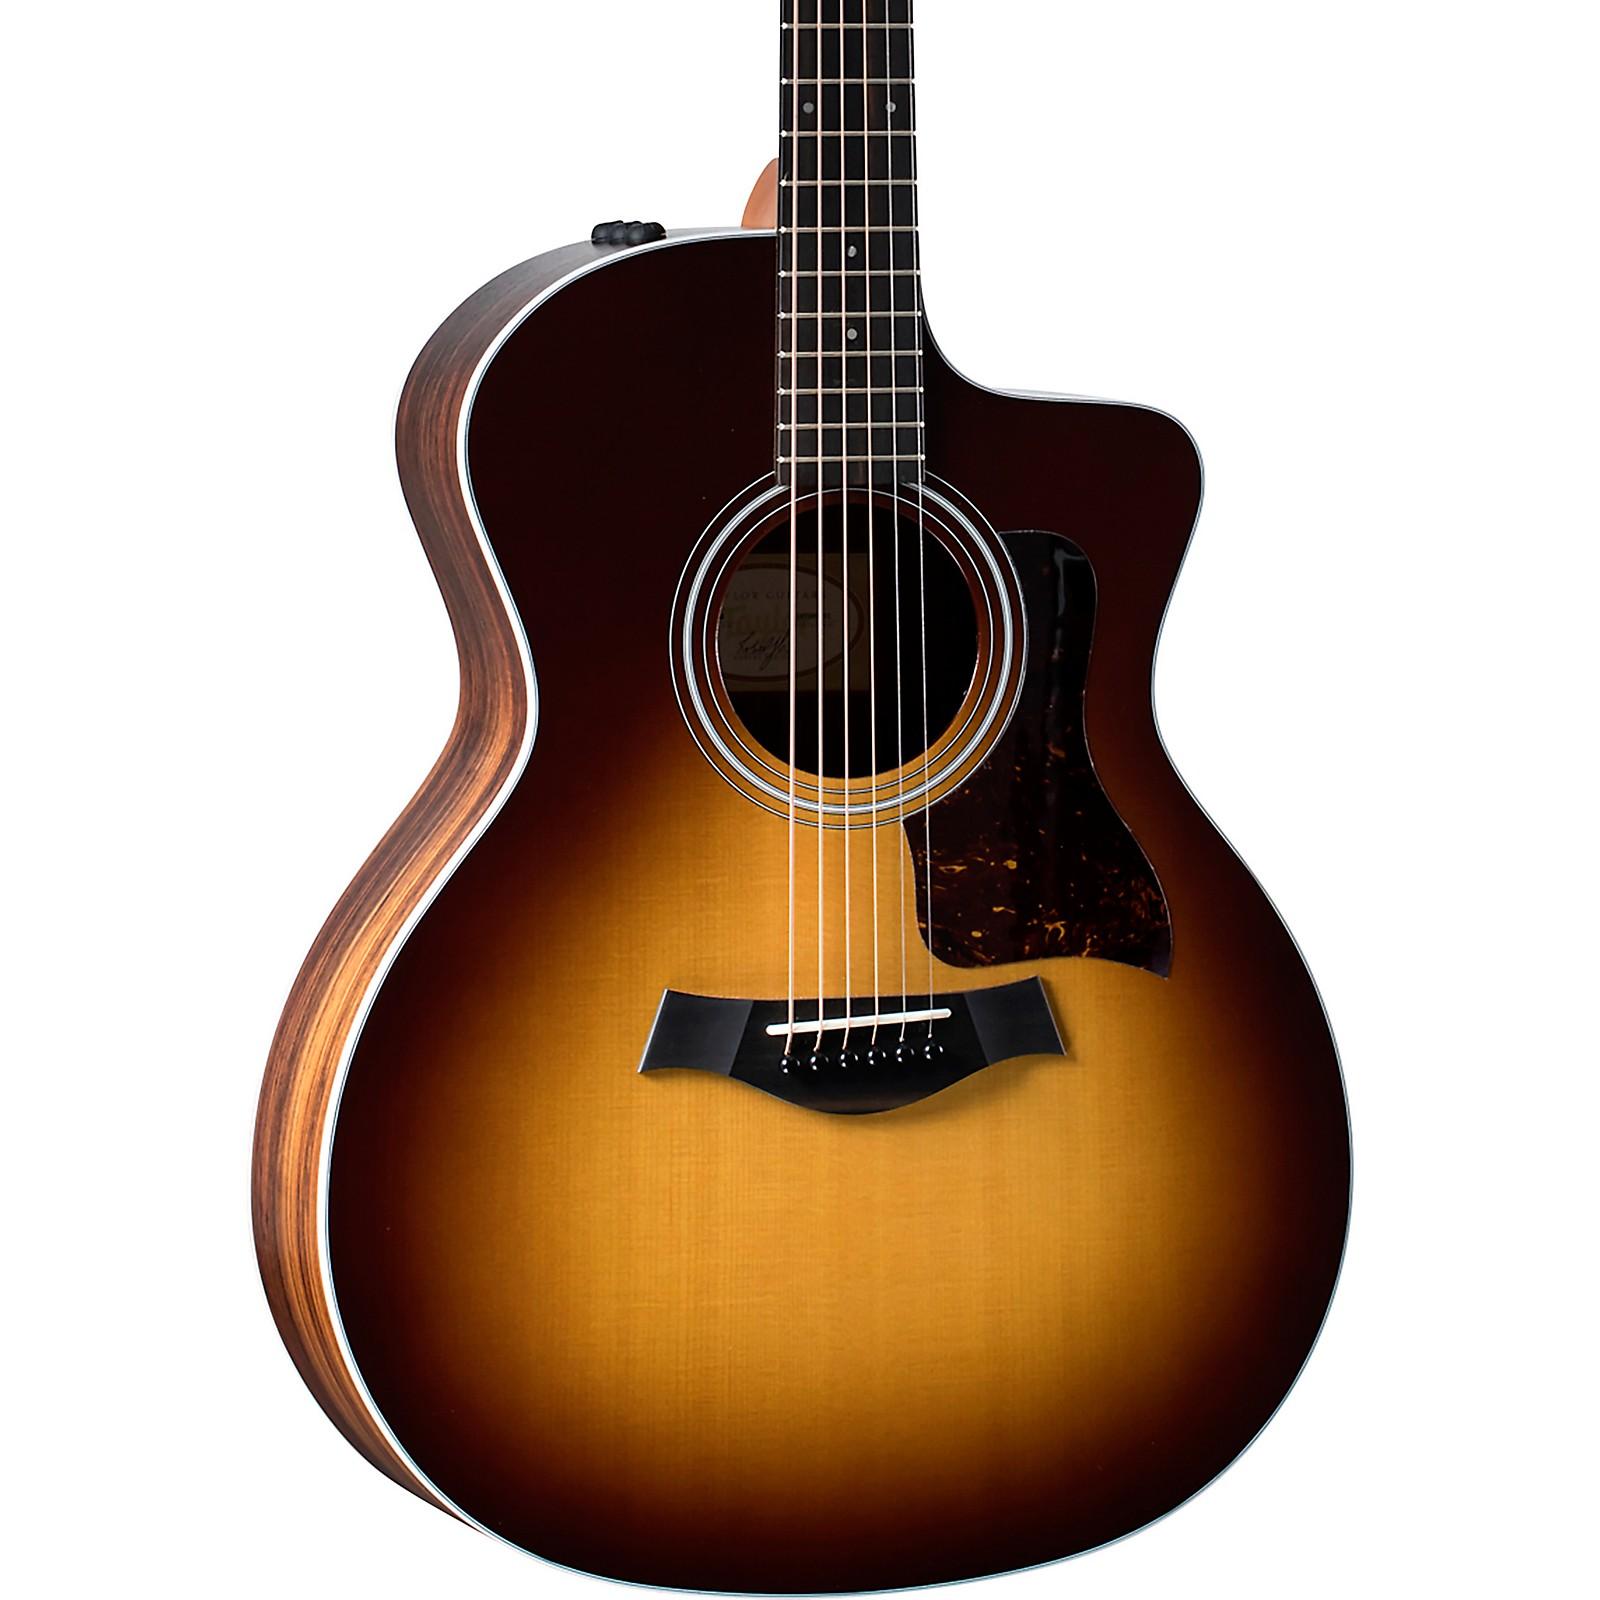 Taylor 114ce Rosewood Grand Auditorium Acoustic-Electric Guitar